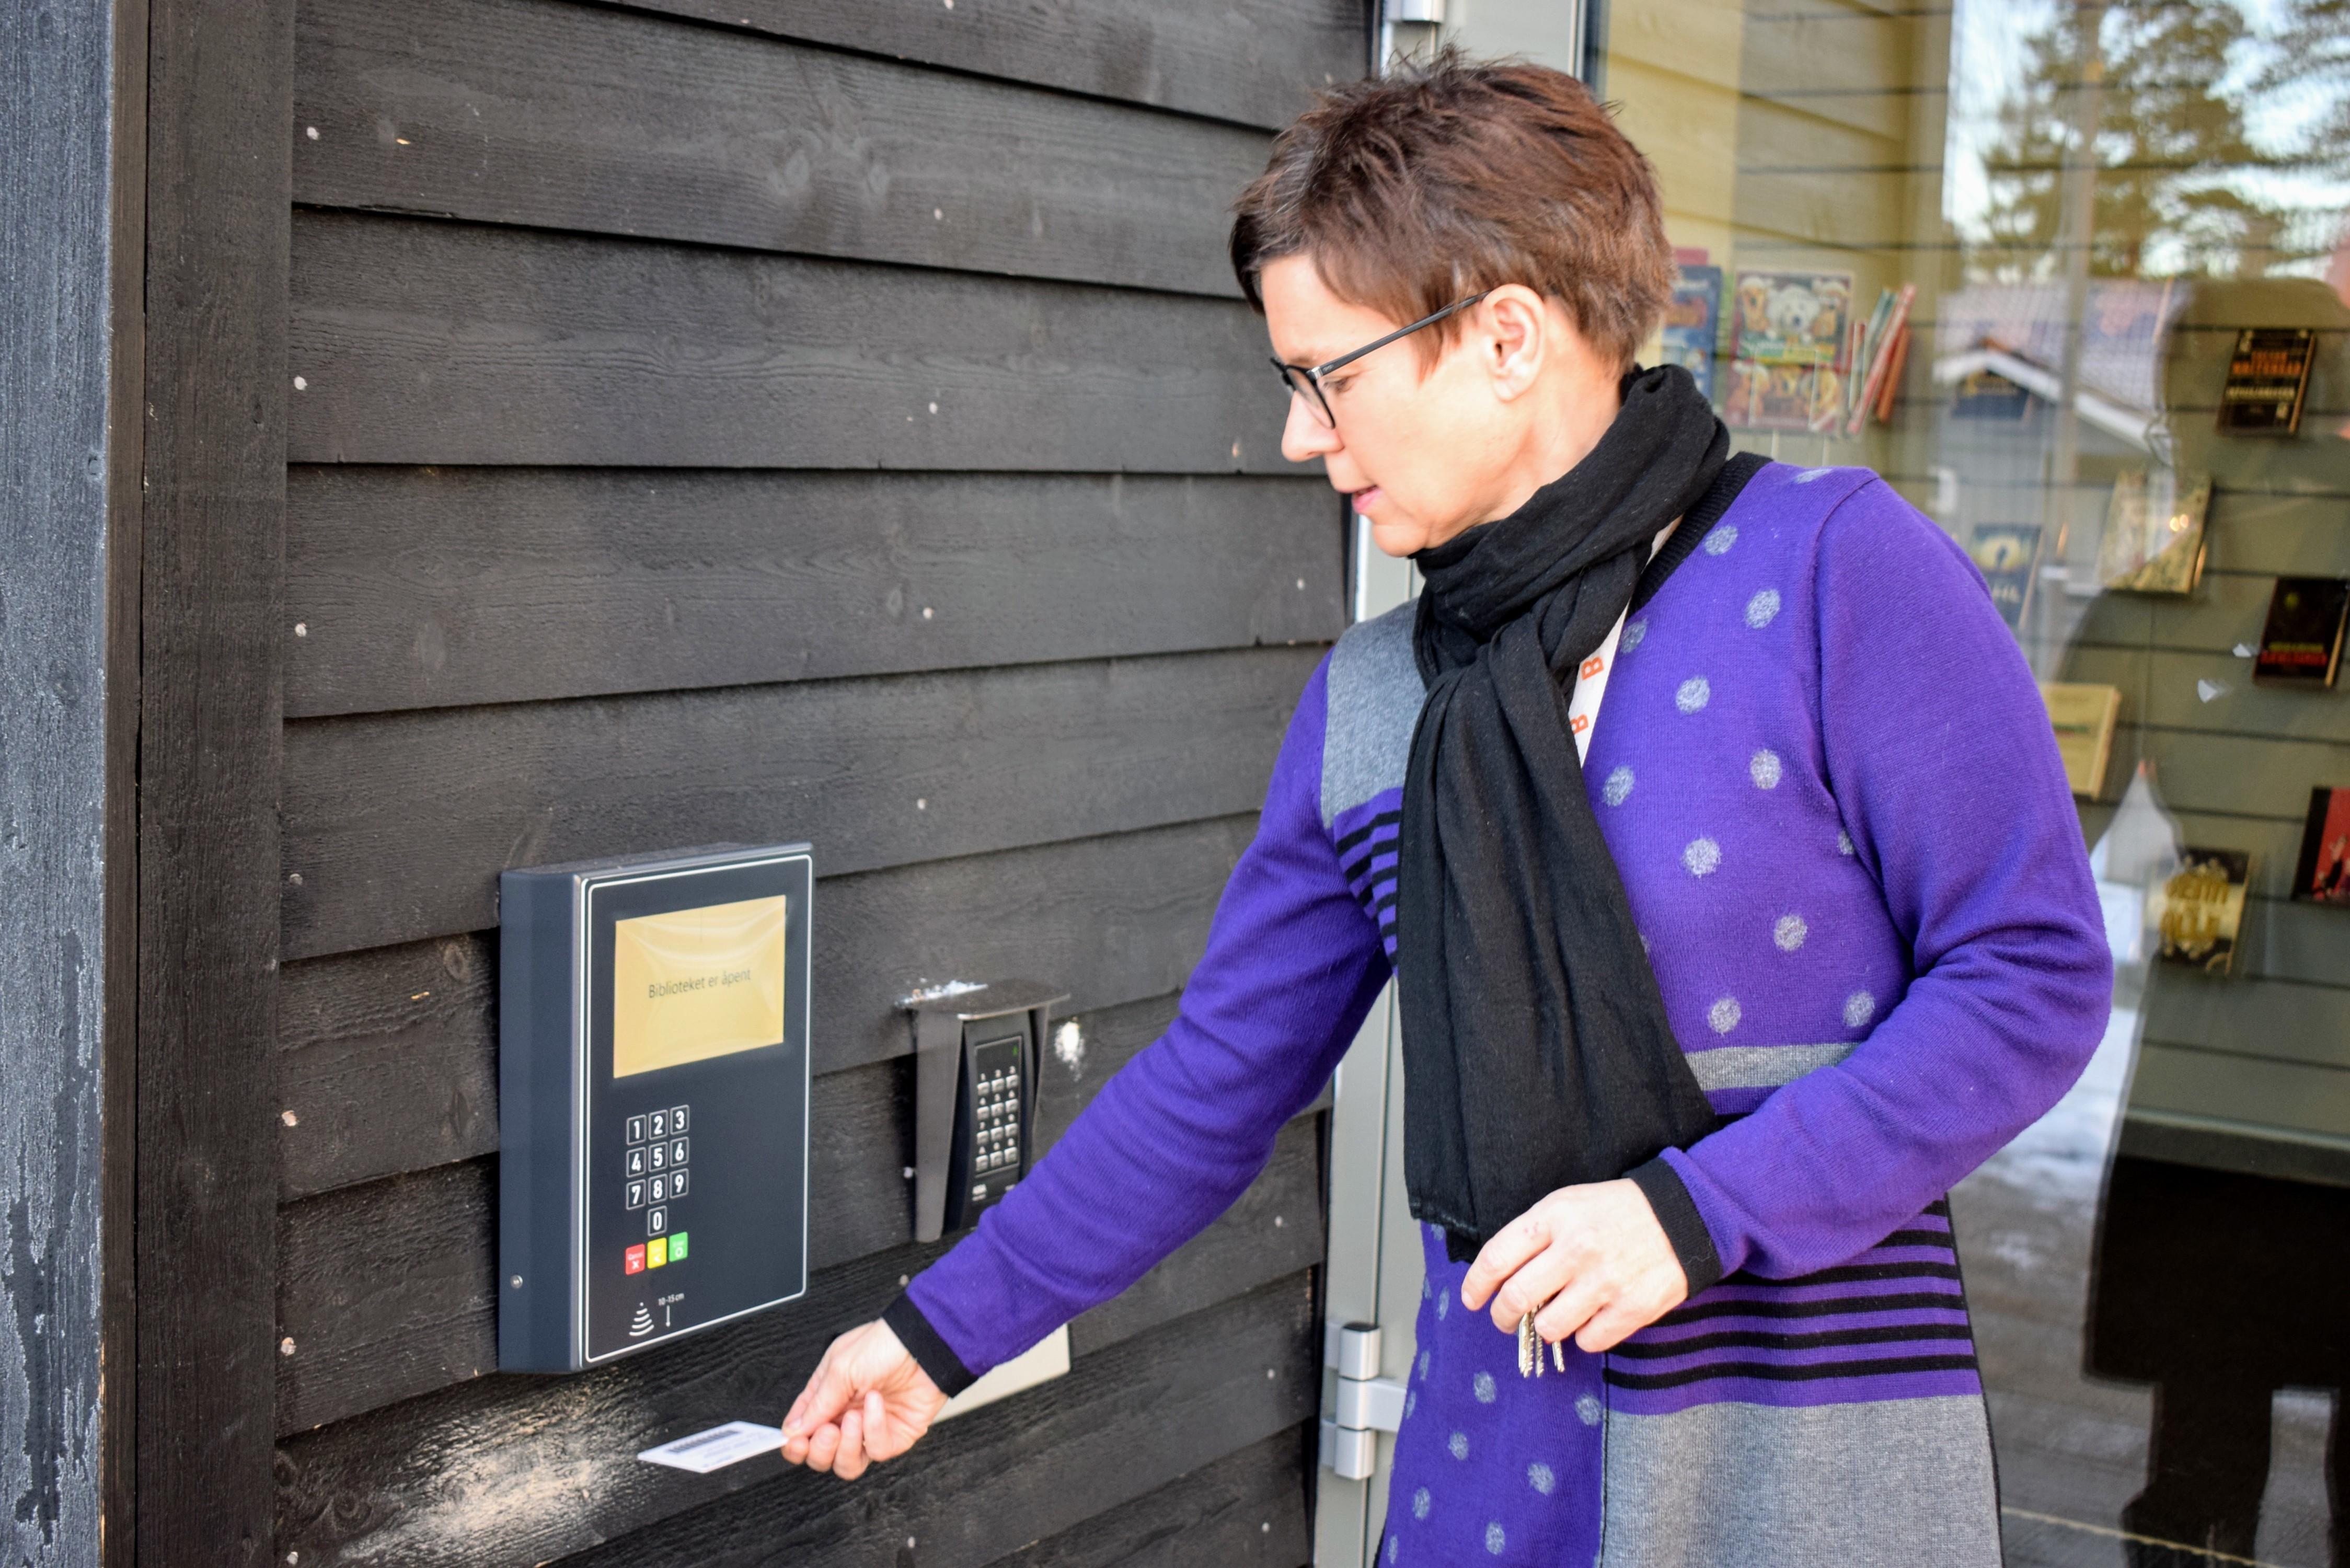 Meråpent bibliotek - Aremark bibliotek - Kathrine Walthinsen (3).JPG